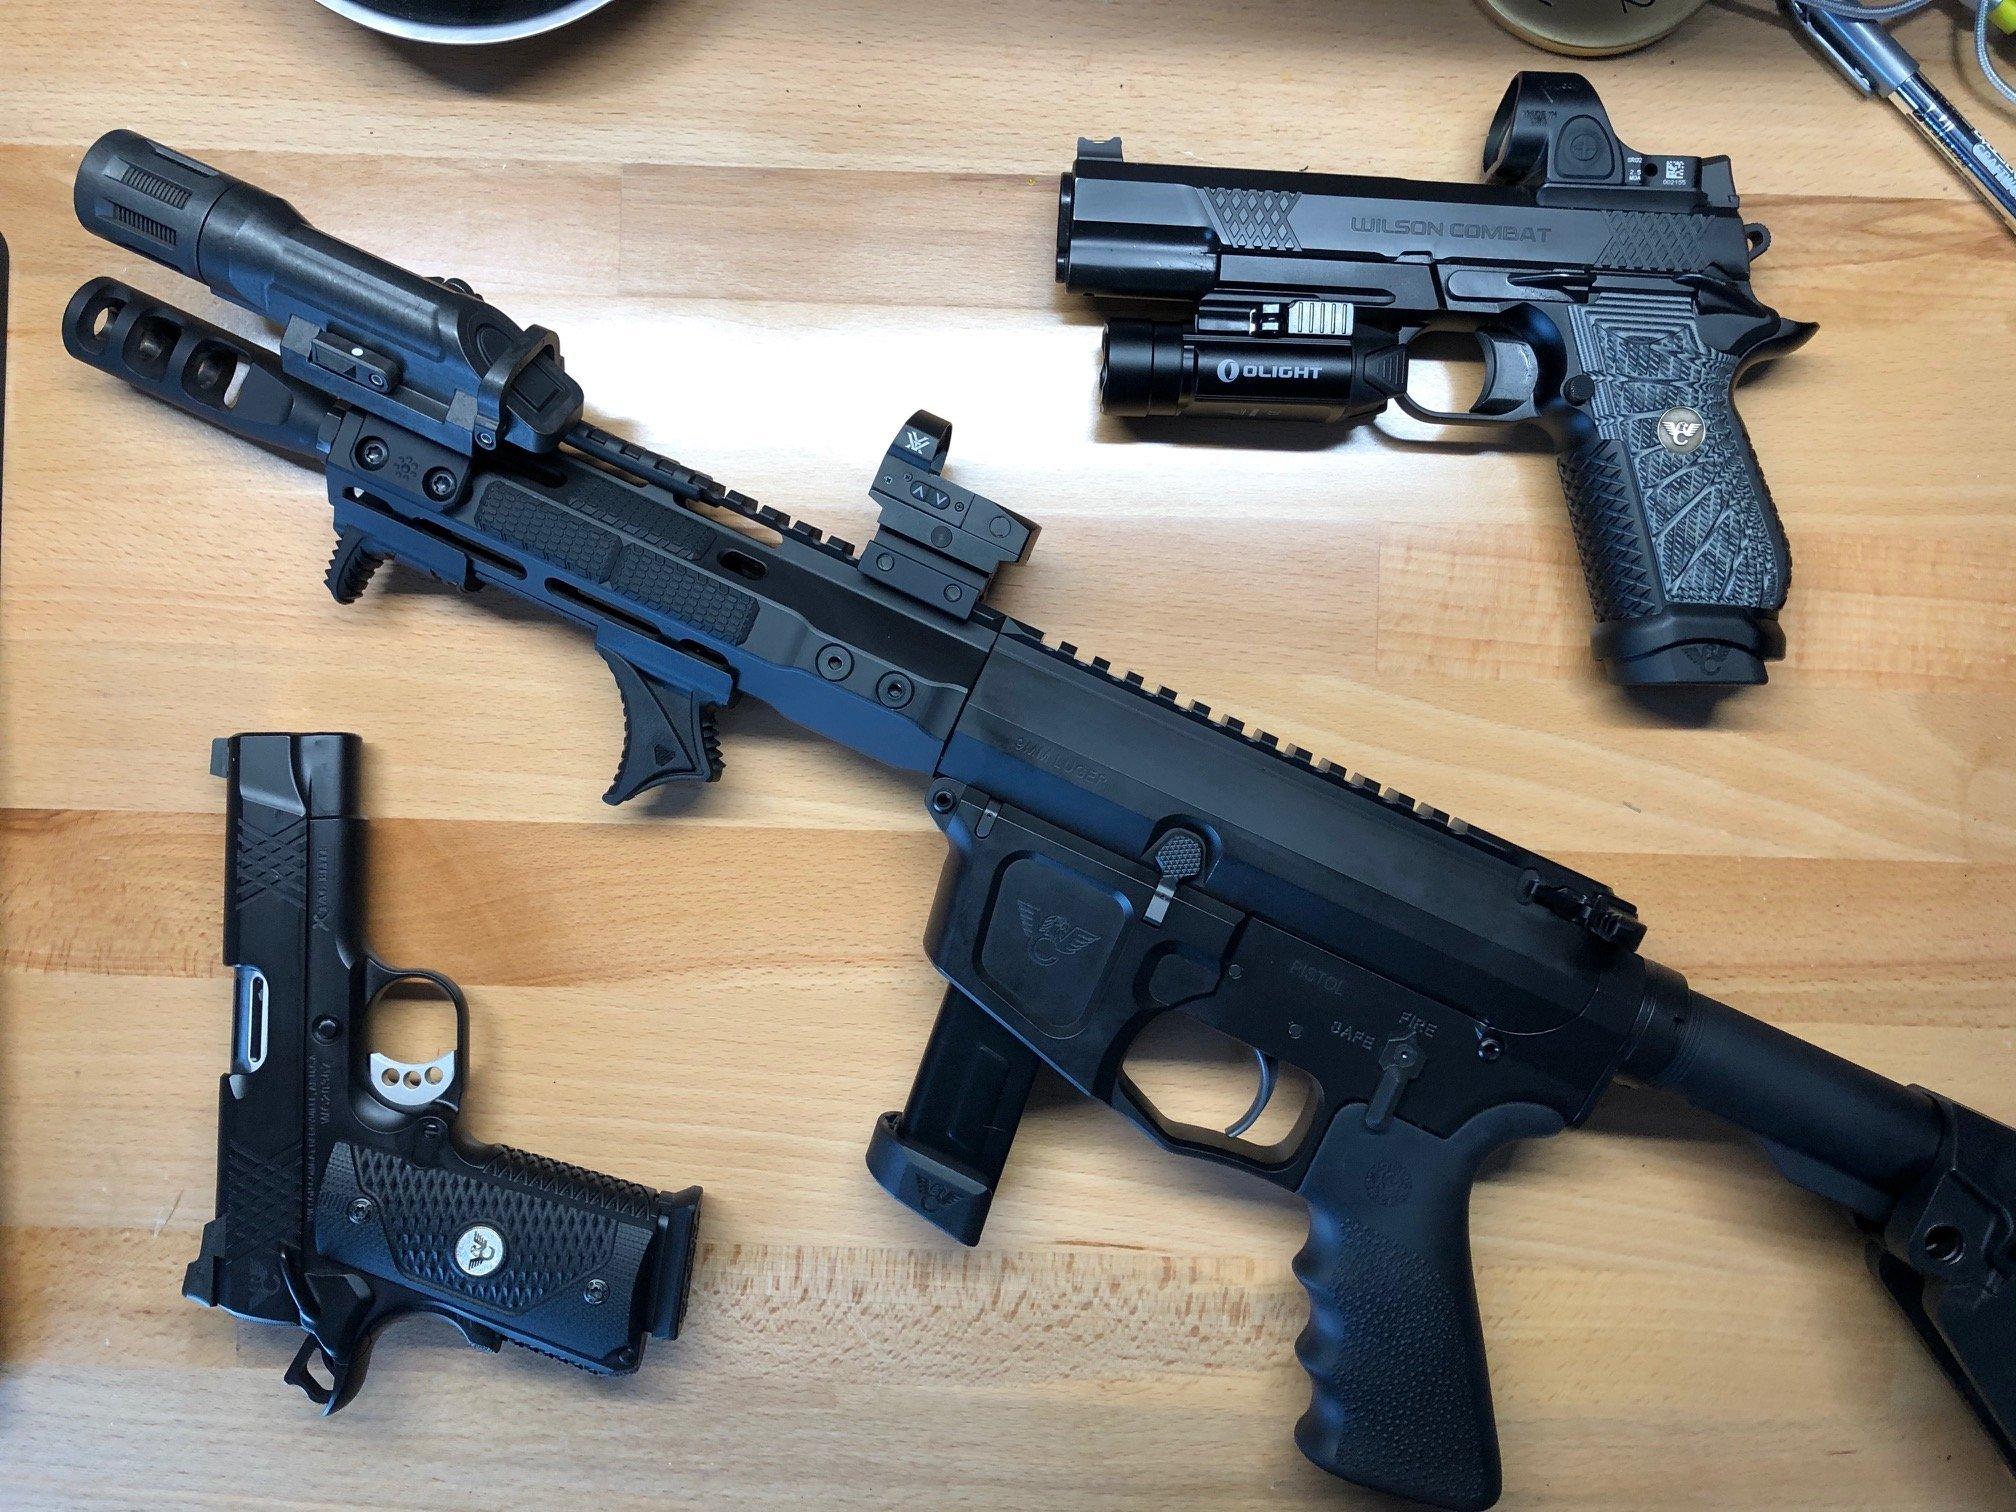 Click image for larger version  Name:Wilson Guns.jpg Views:14 Size:746.8 KB ID:583488